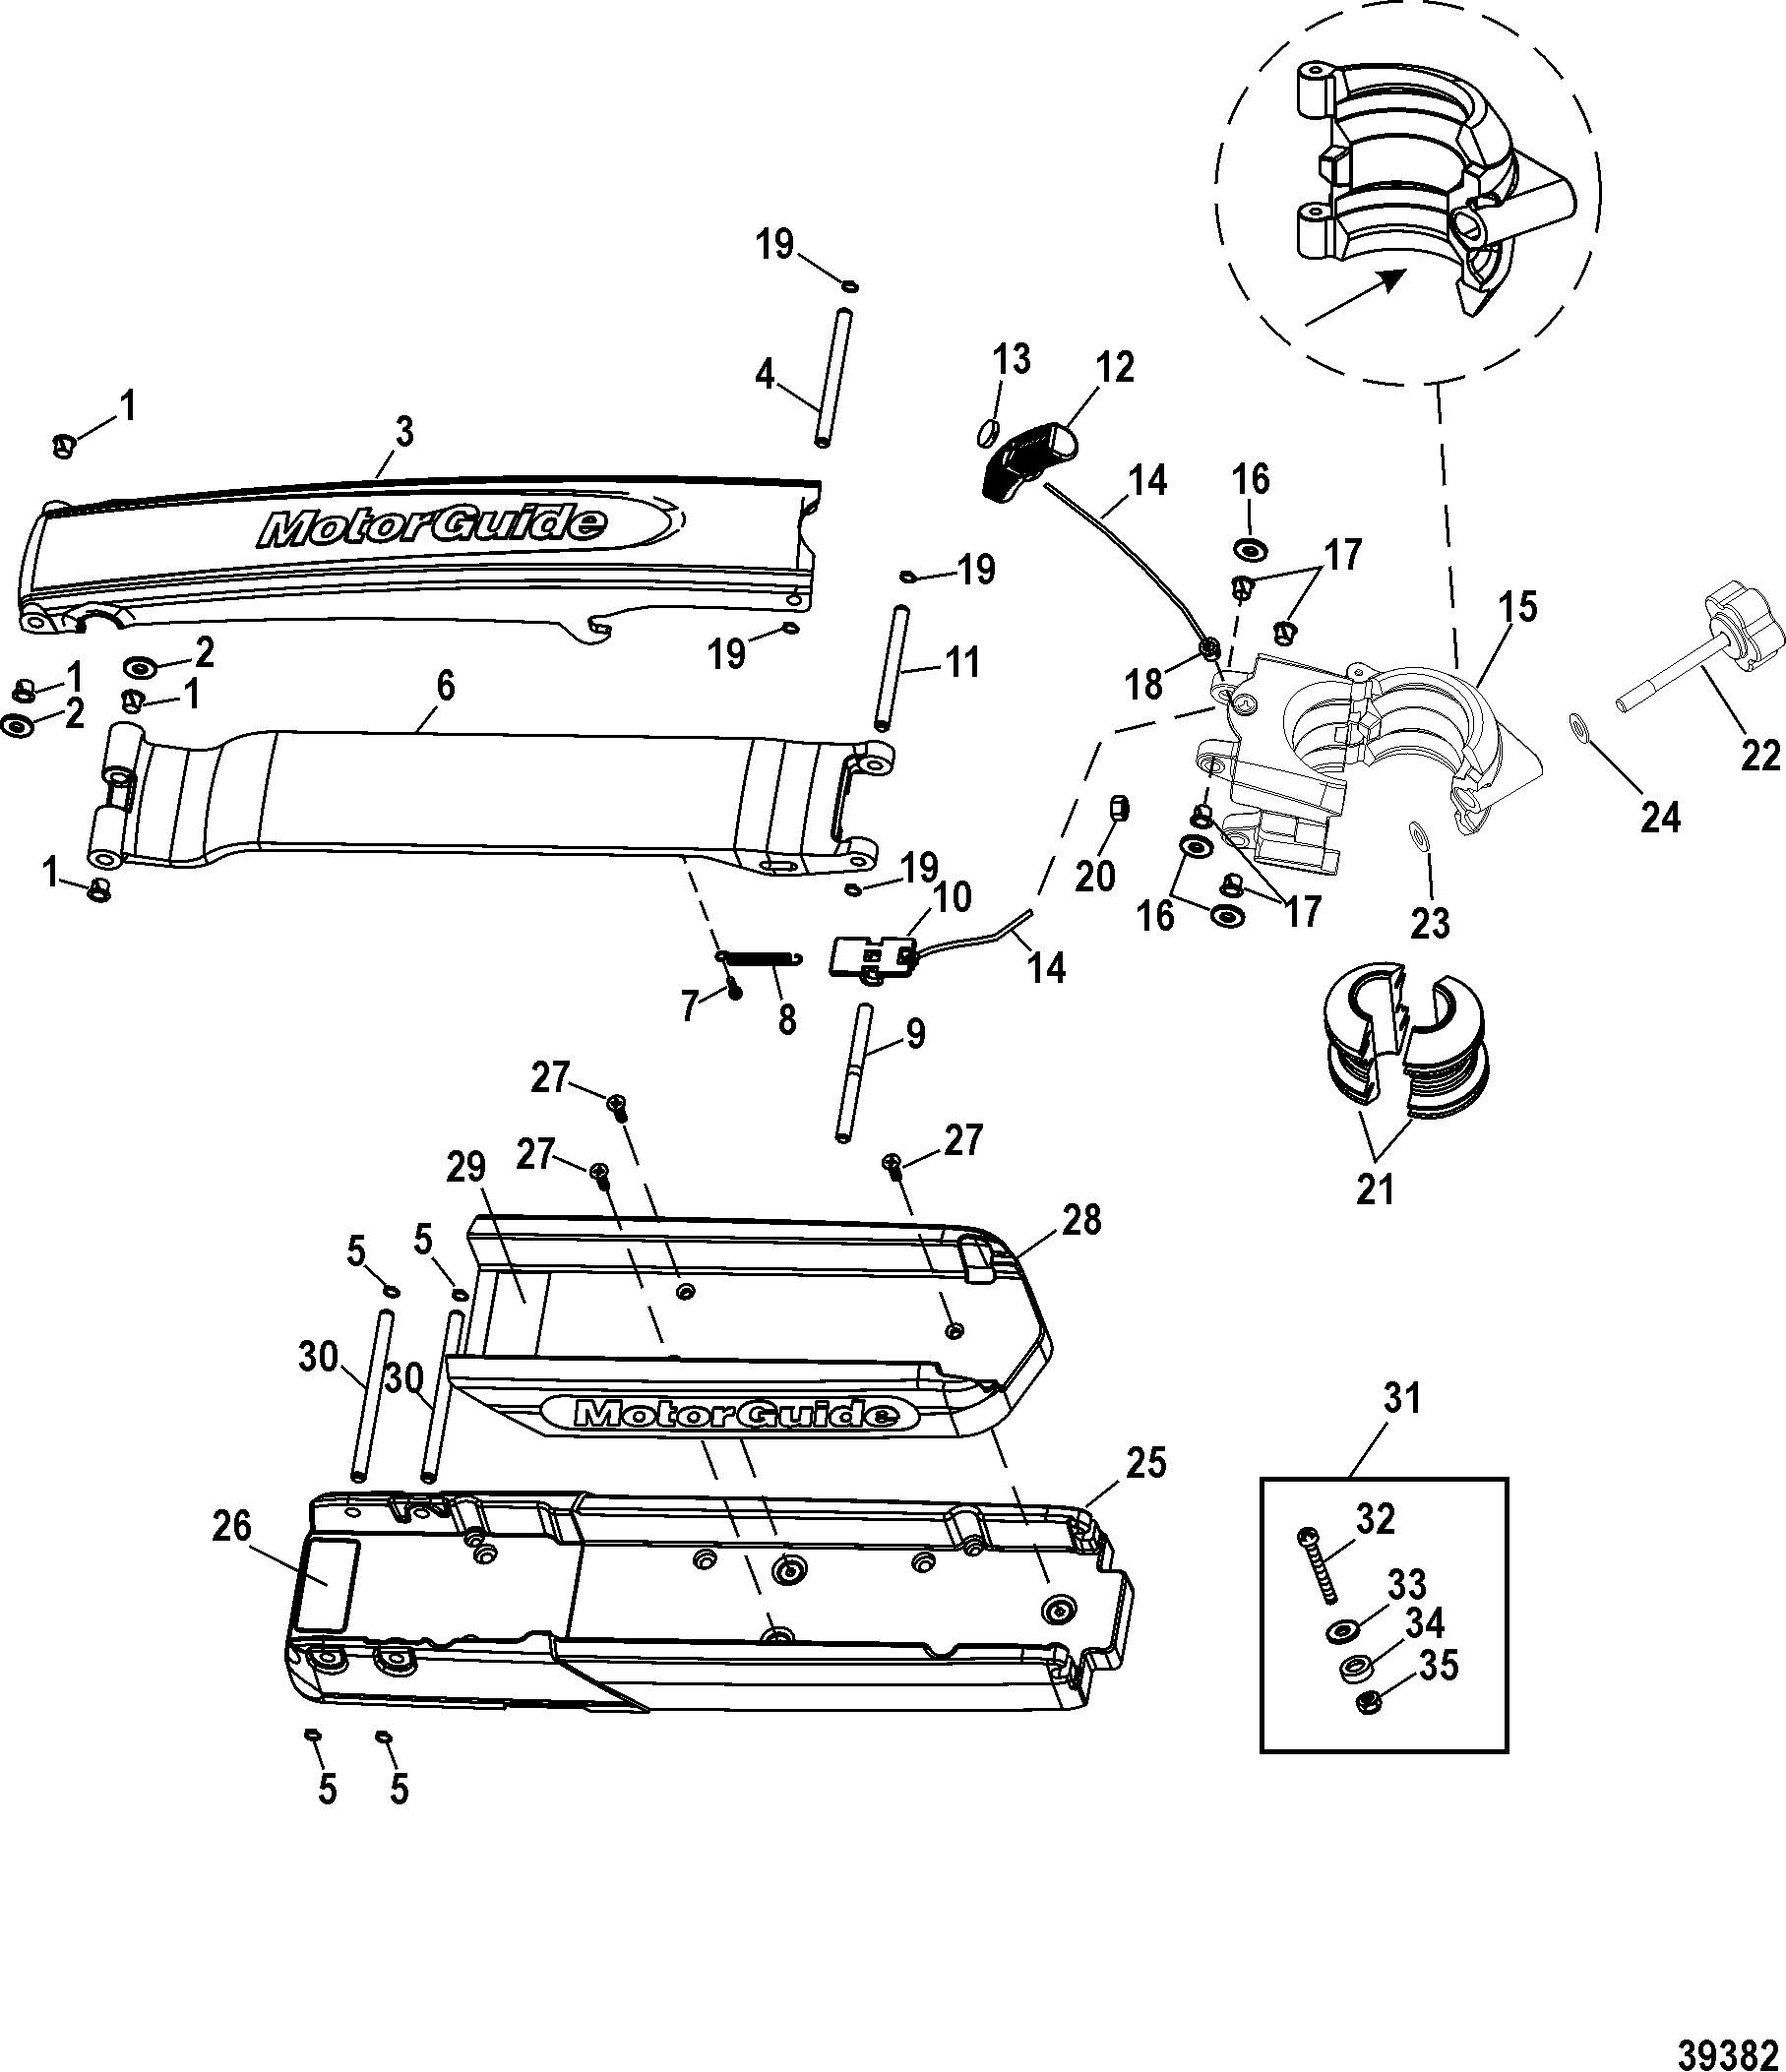 39382 prowler trolling motor wiring diagram trolling motor dimensions mercury thruster trolling motor wiring diagram at cos-gaming.co